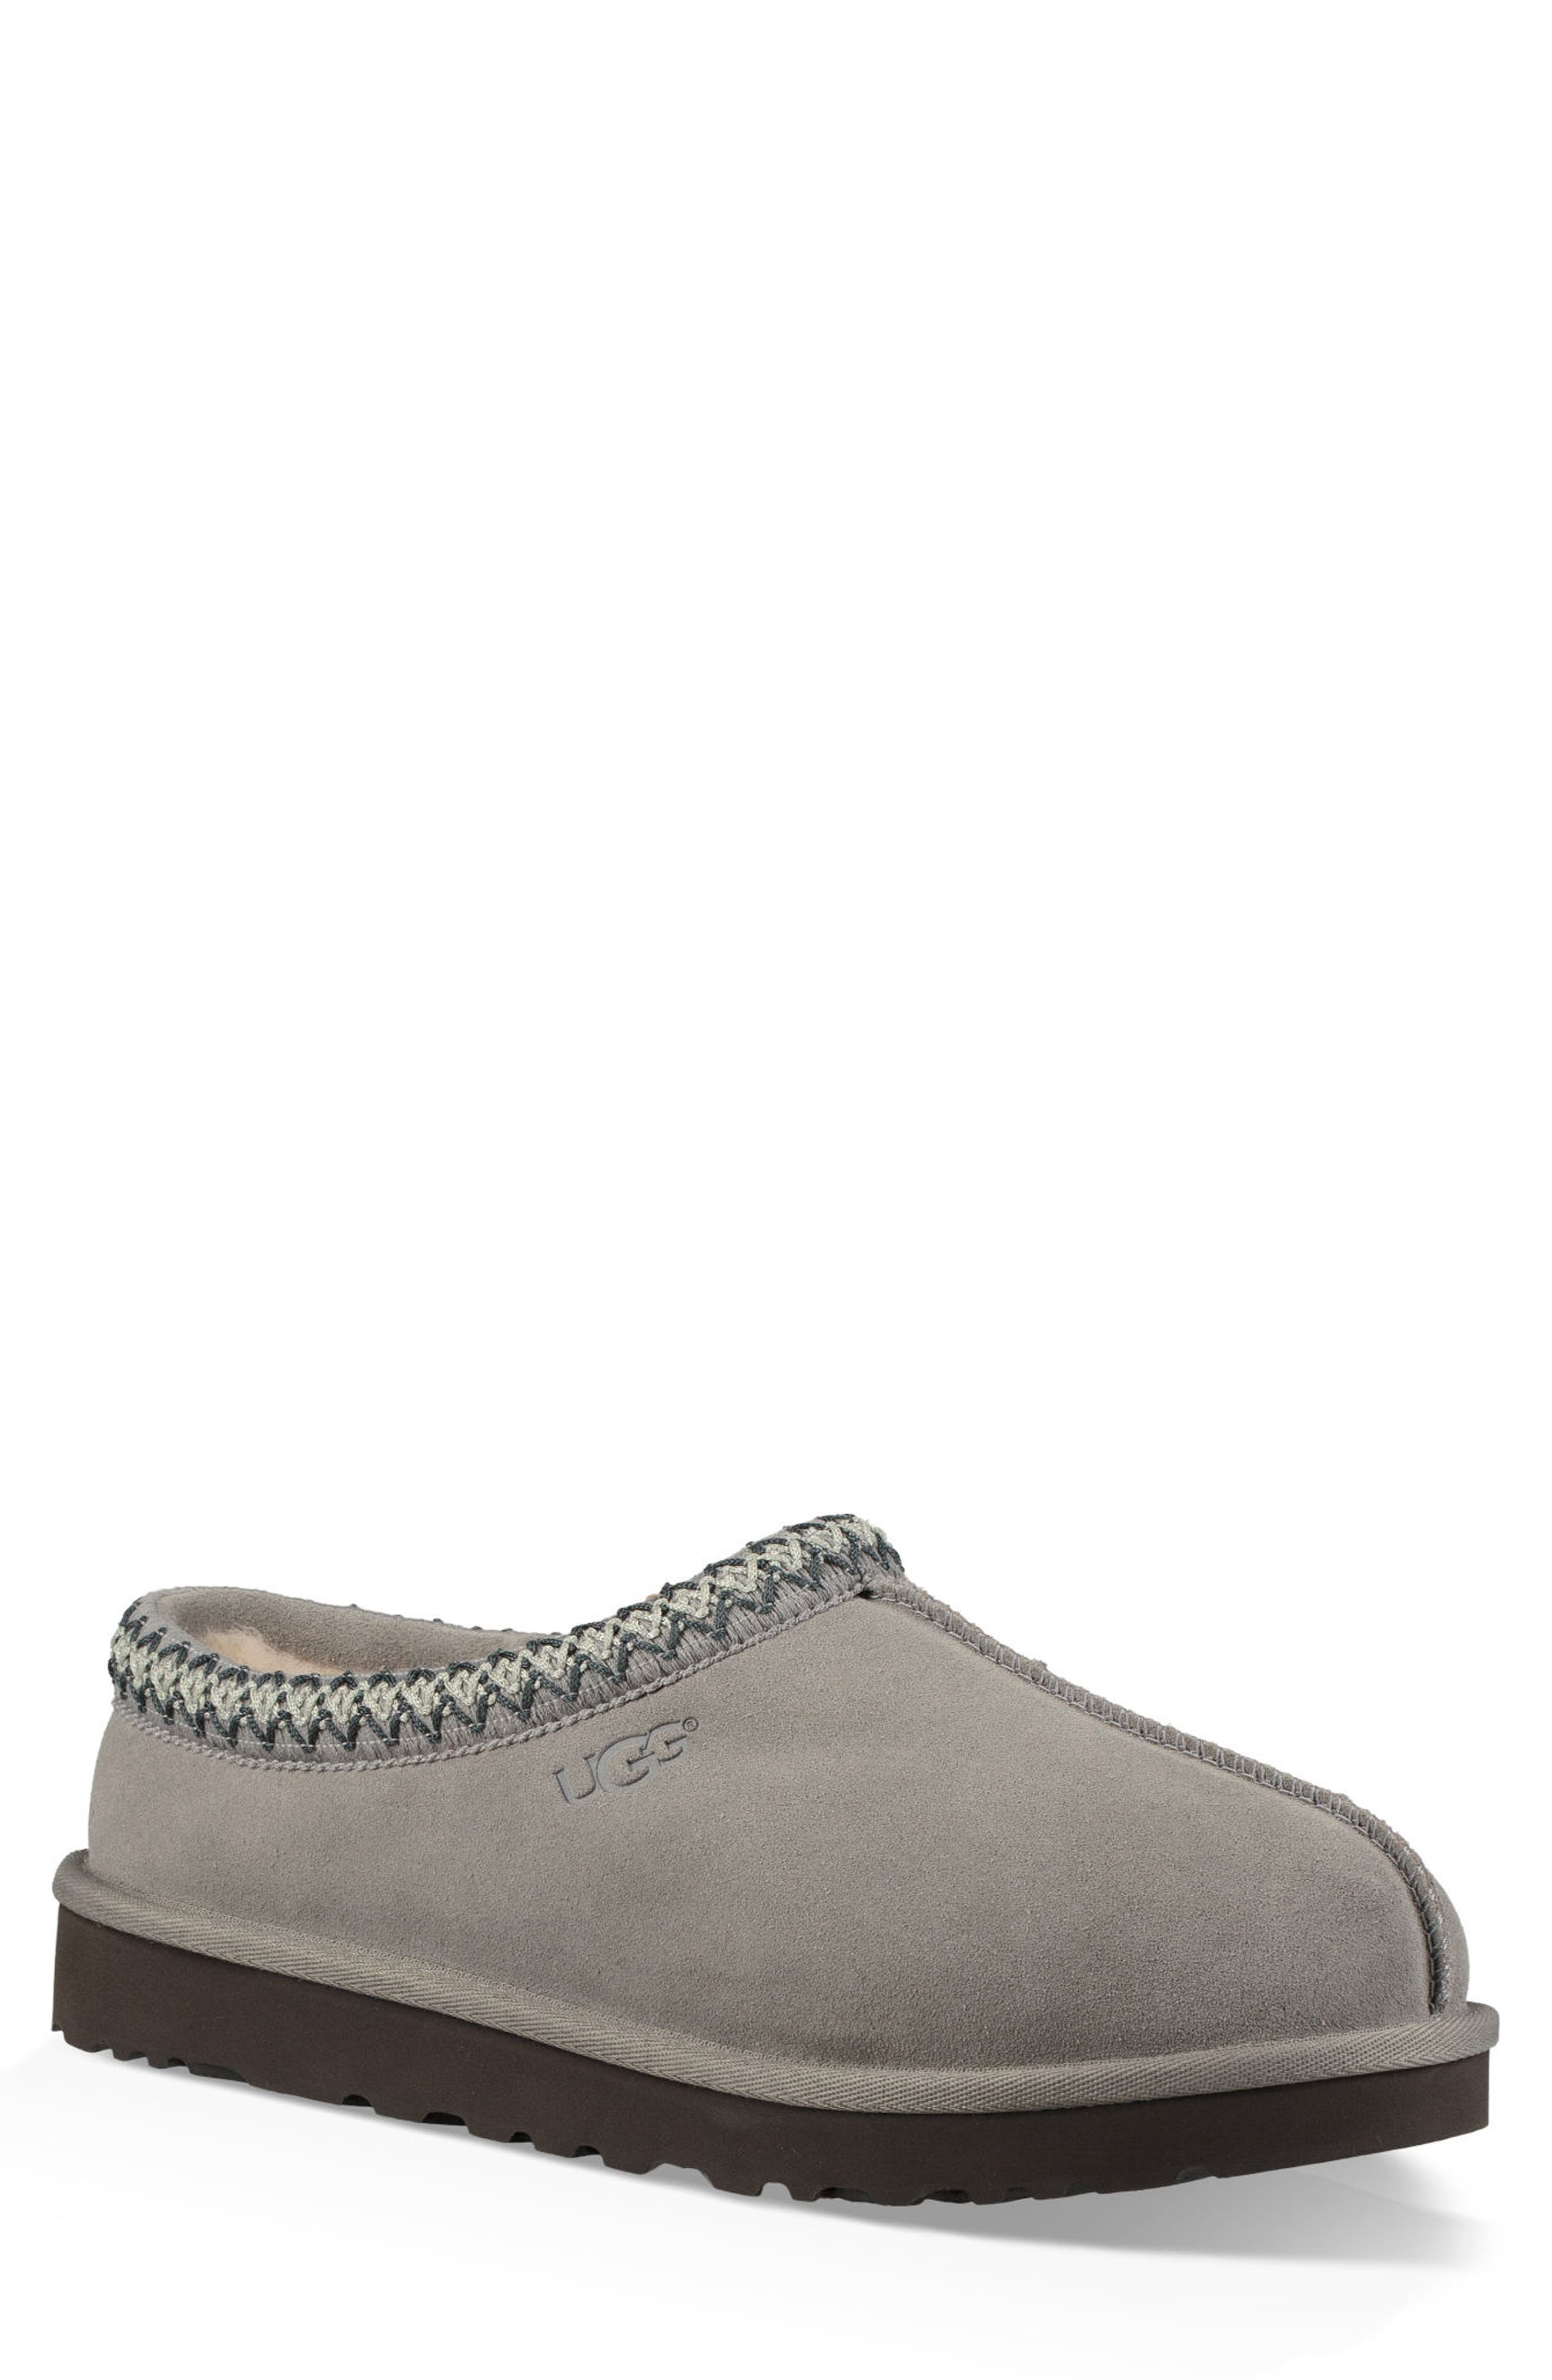 8673b51f597 UGG® Men s Blue Boots